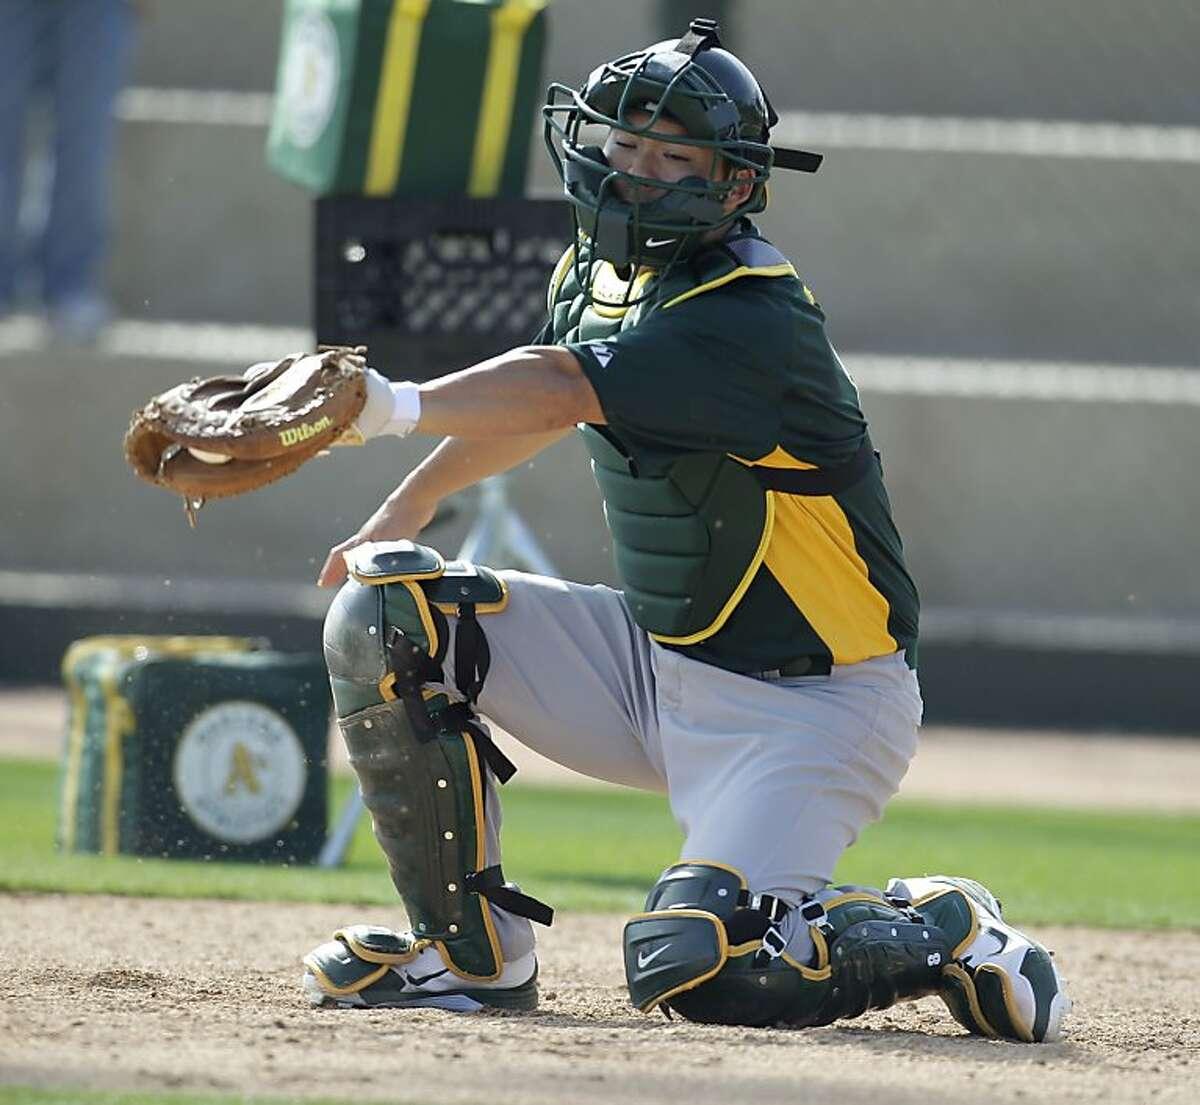 Oakland Athletics' Kurt Suzuki makes a catch during a spring training baseball workout, Monday, Feb. 20, 2012, in Phoenix. (AP Photo/Darron Cummings)